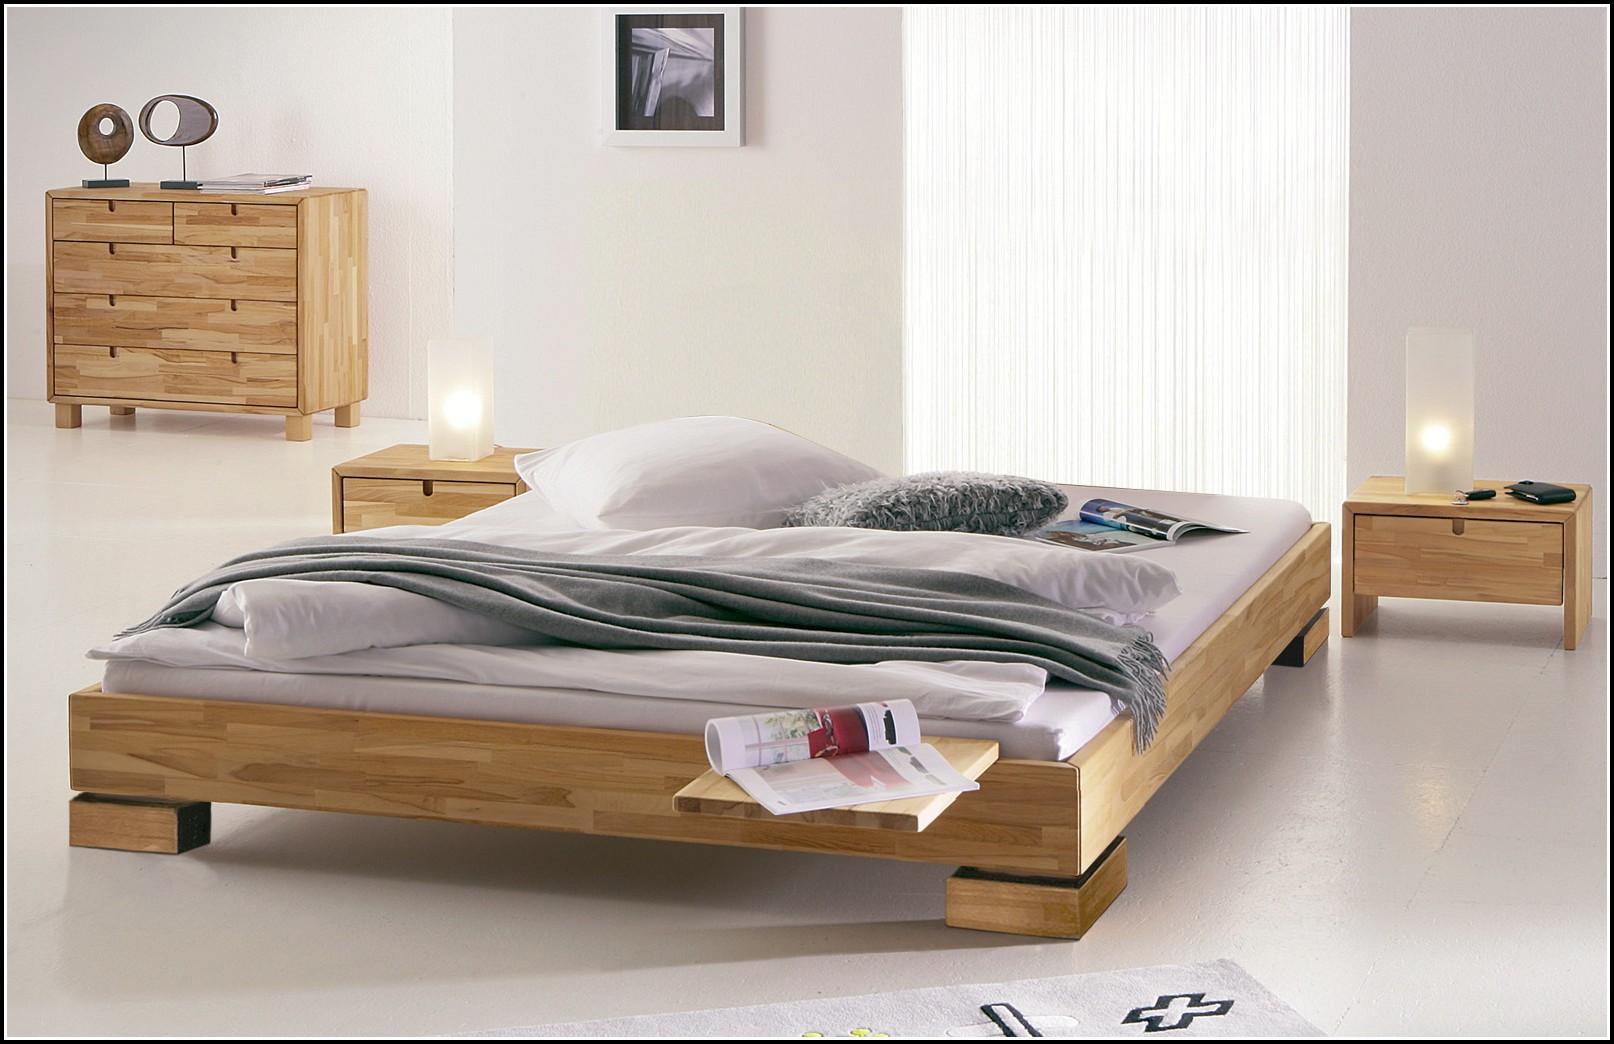 Betten Auf Raten Trotz Schufa